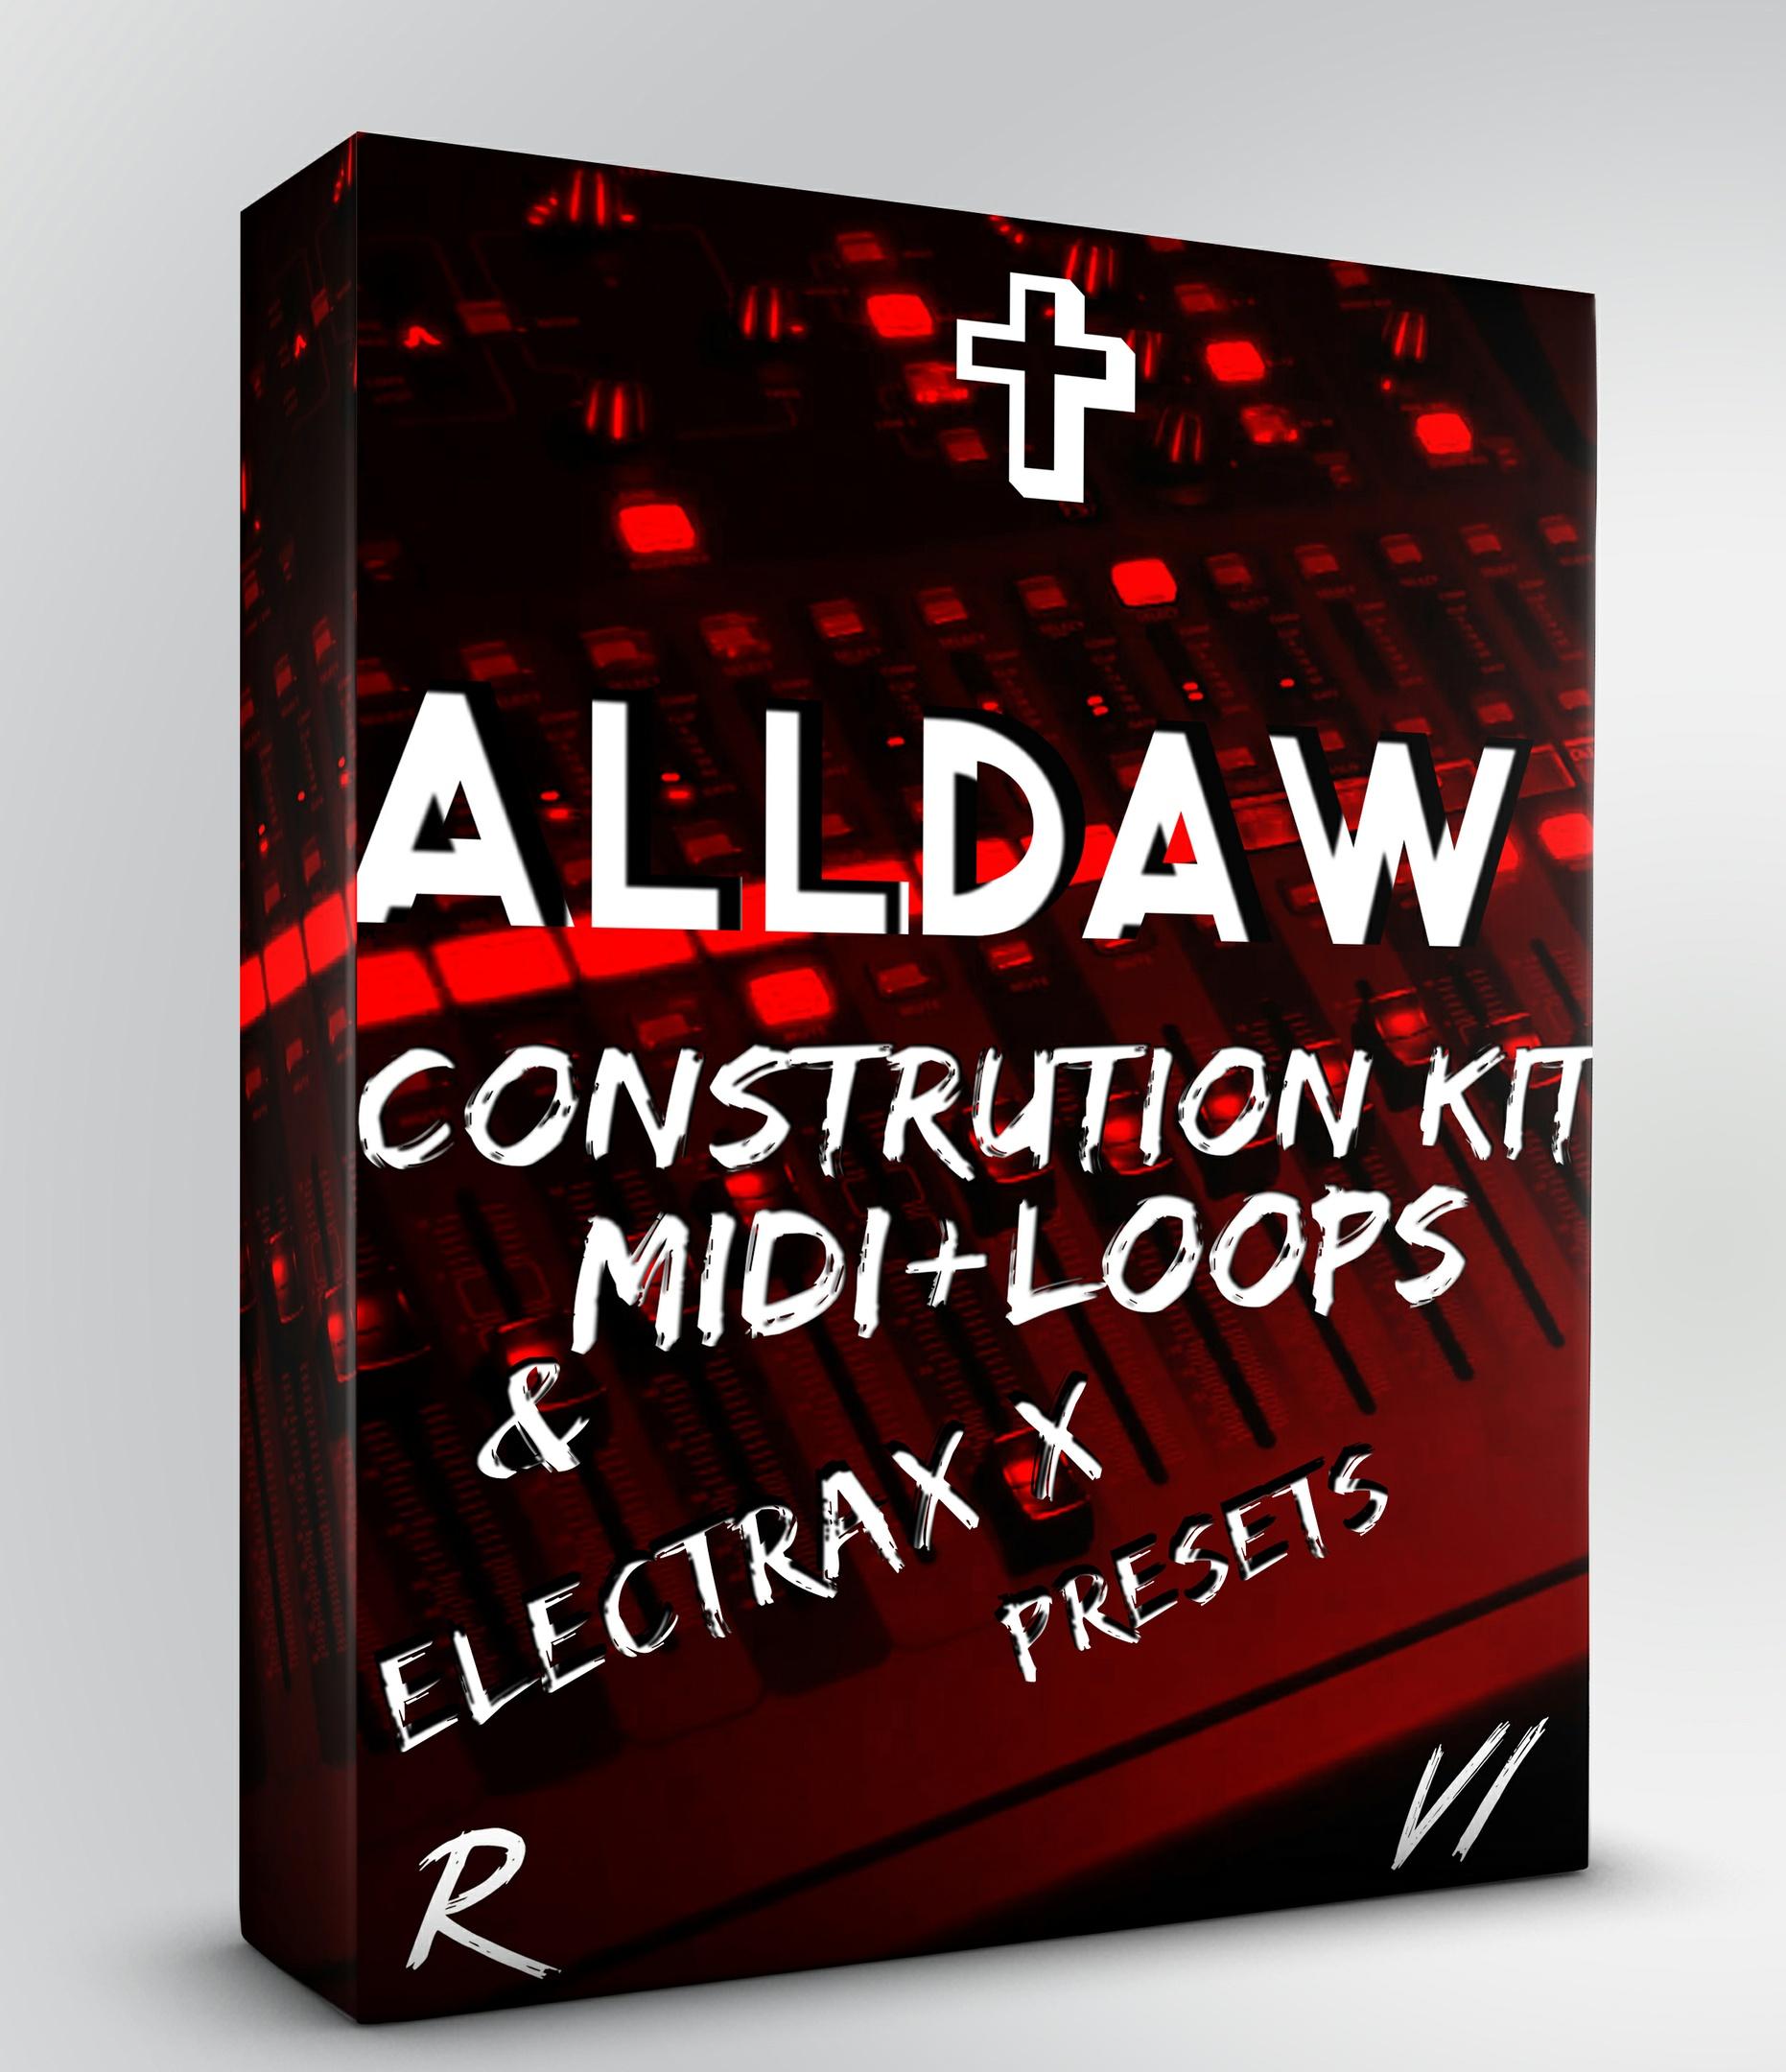 Beat Krist Construction Kit